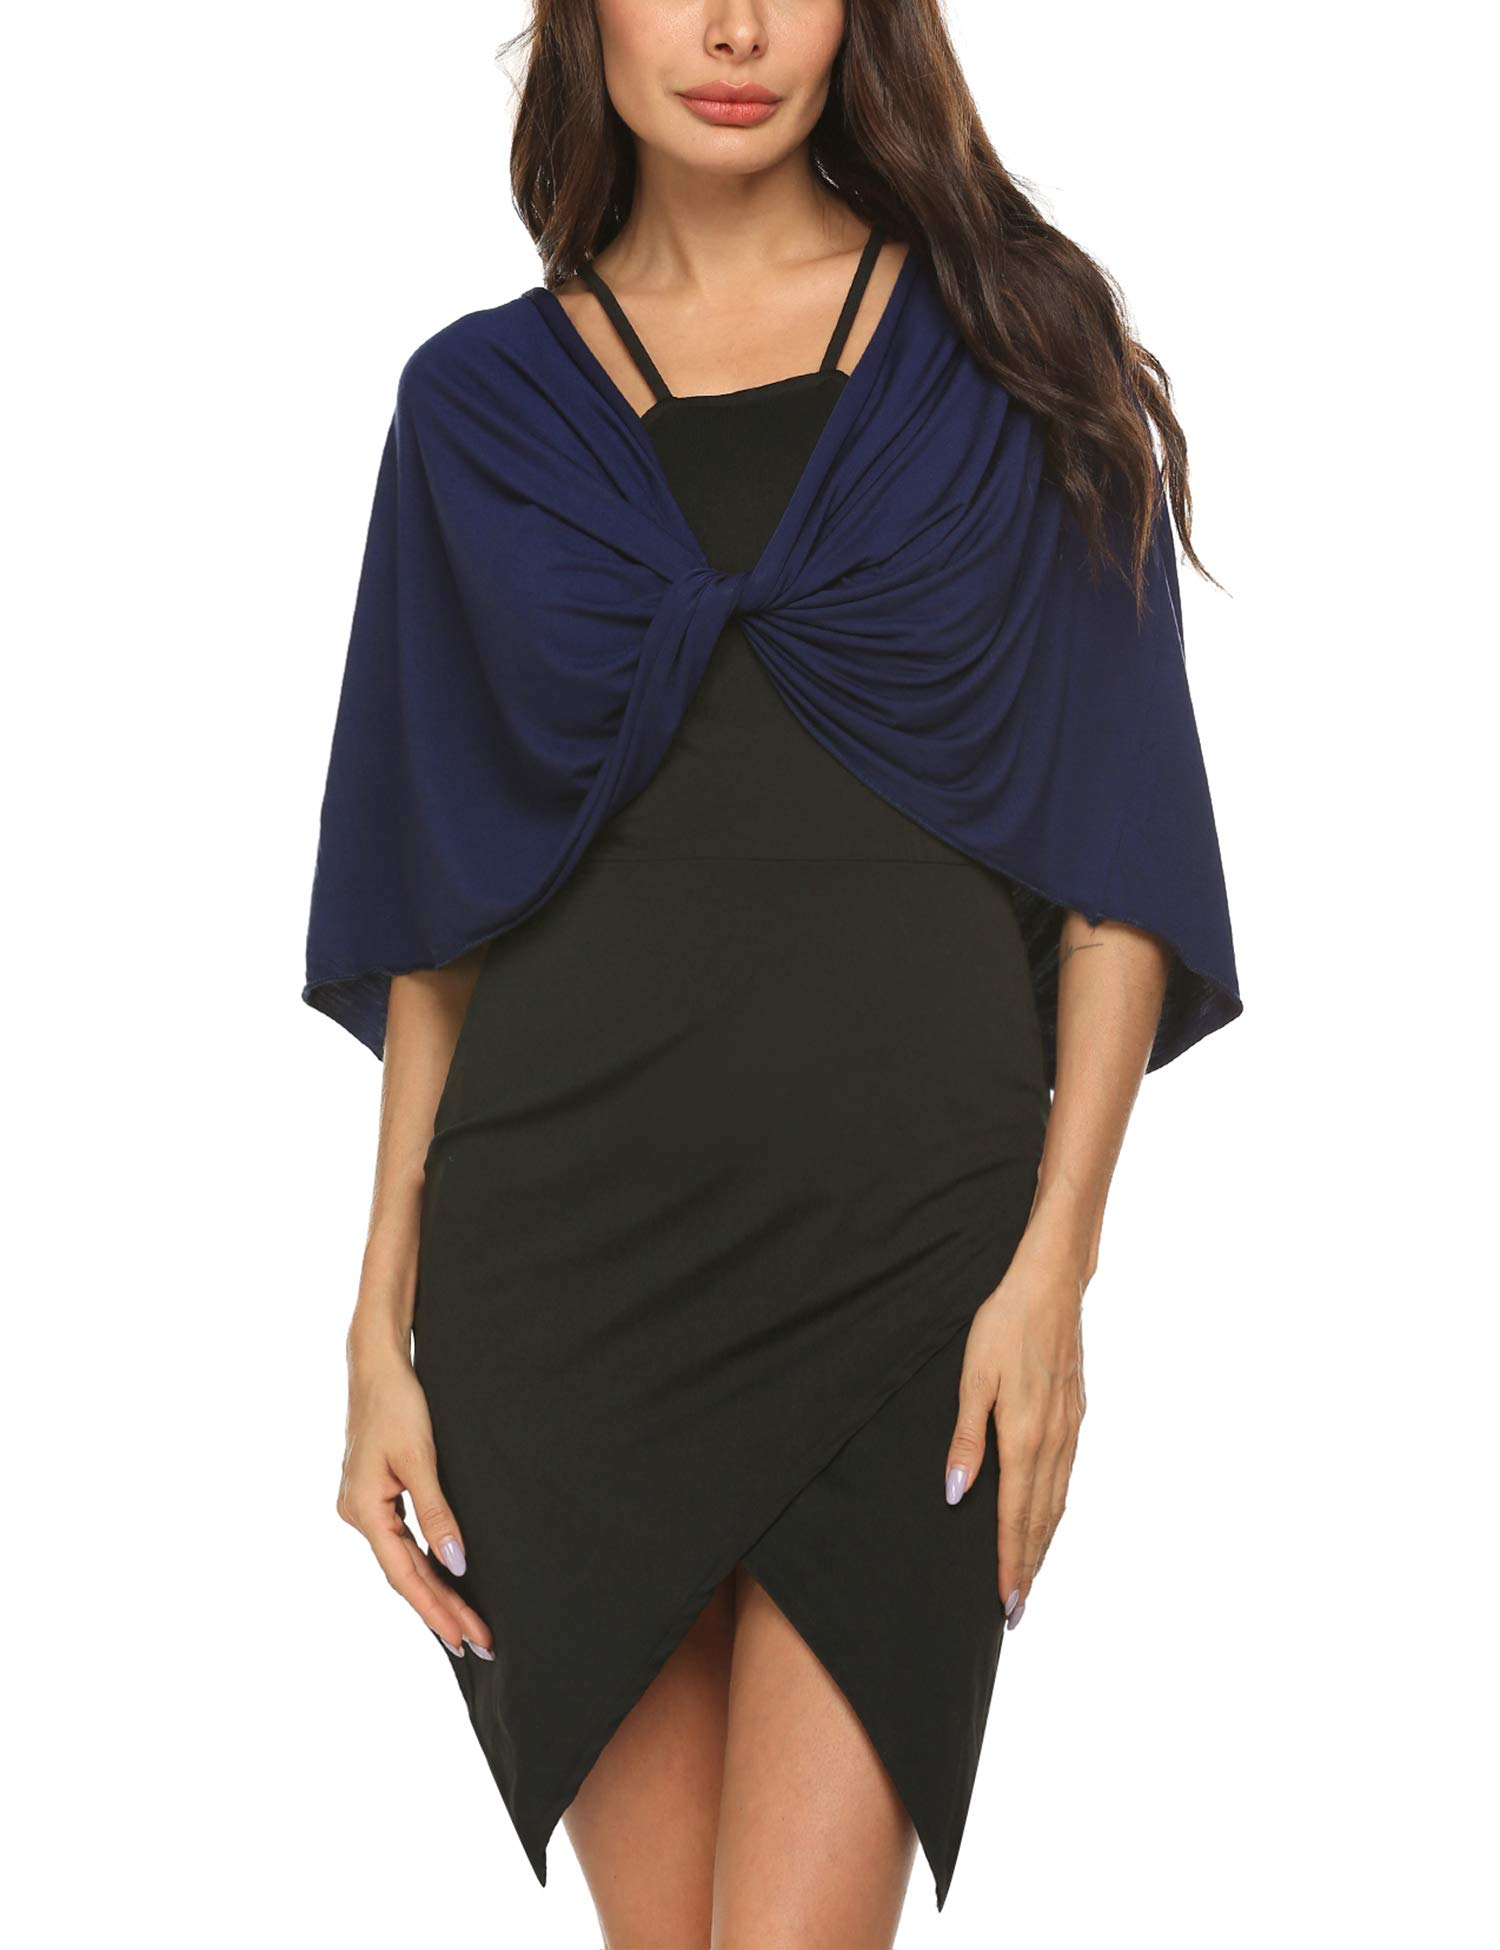 Zeagoo Women's Short Sleeve Shrug Open Front Cardigan Bolero Top Navy Blue